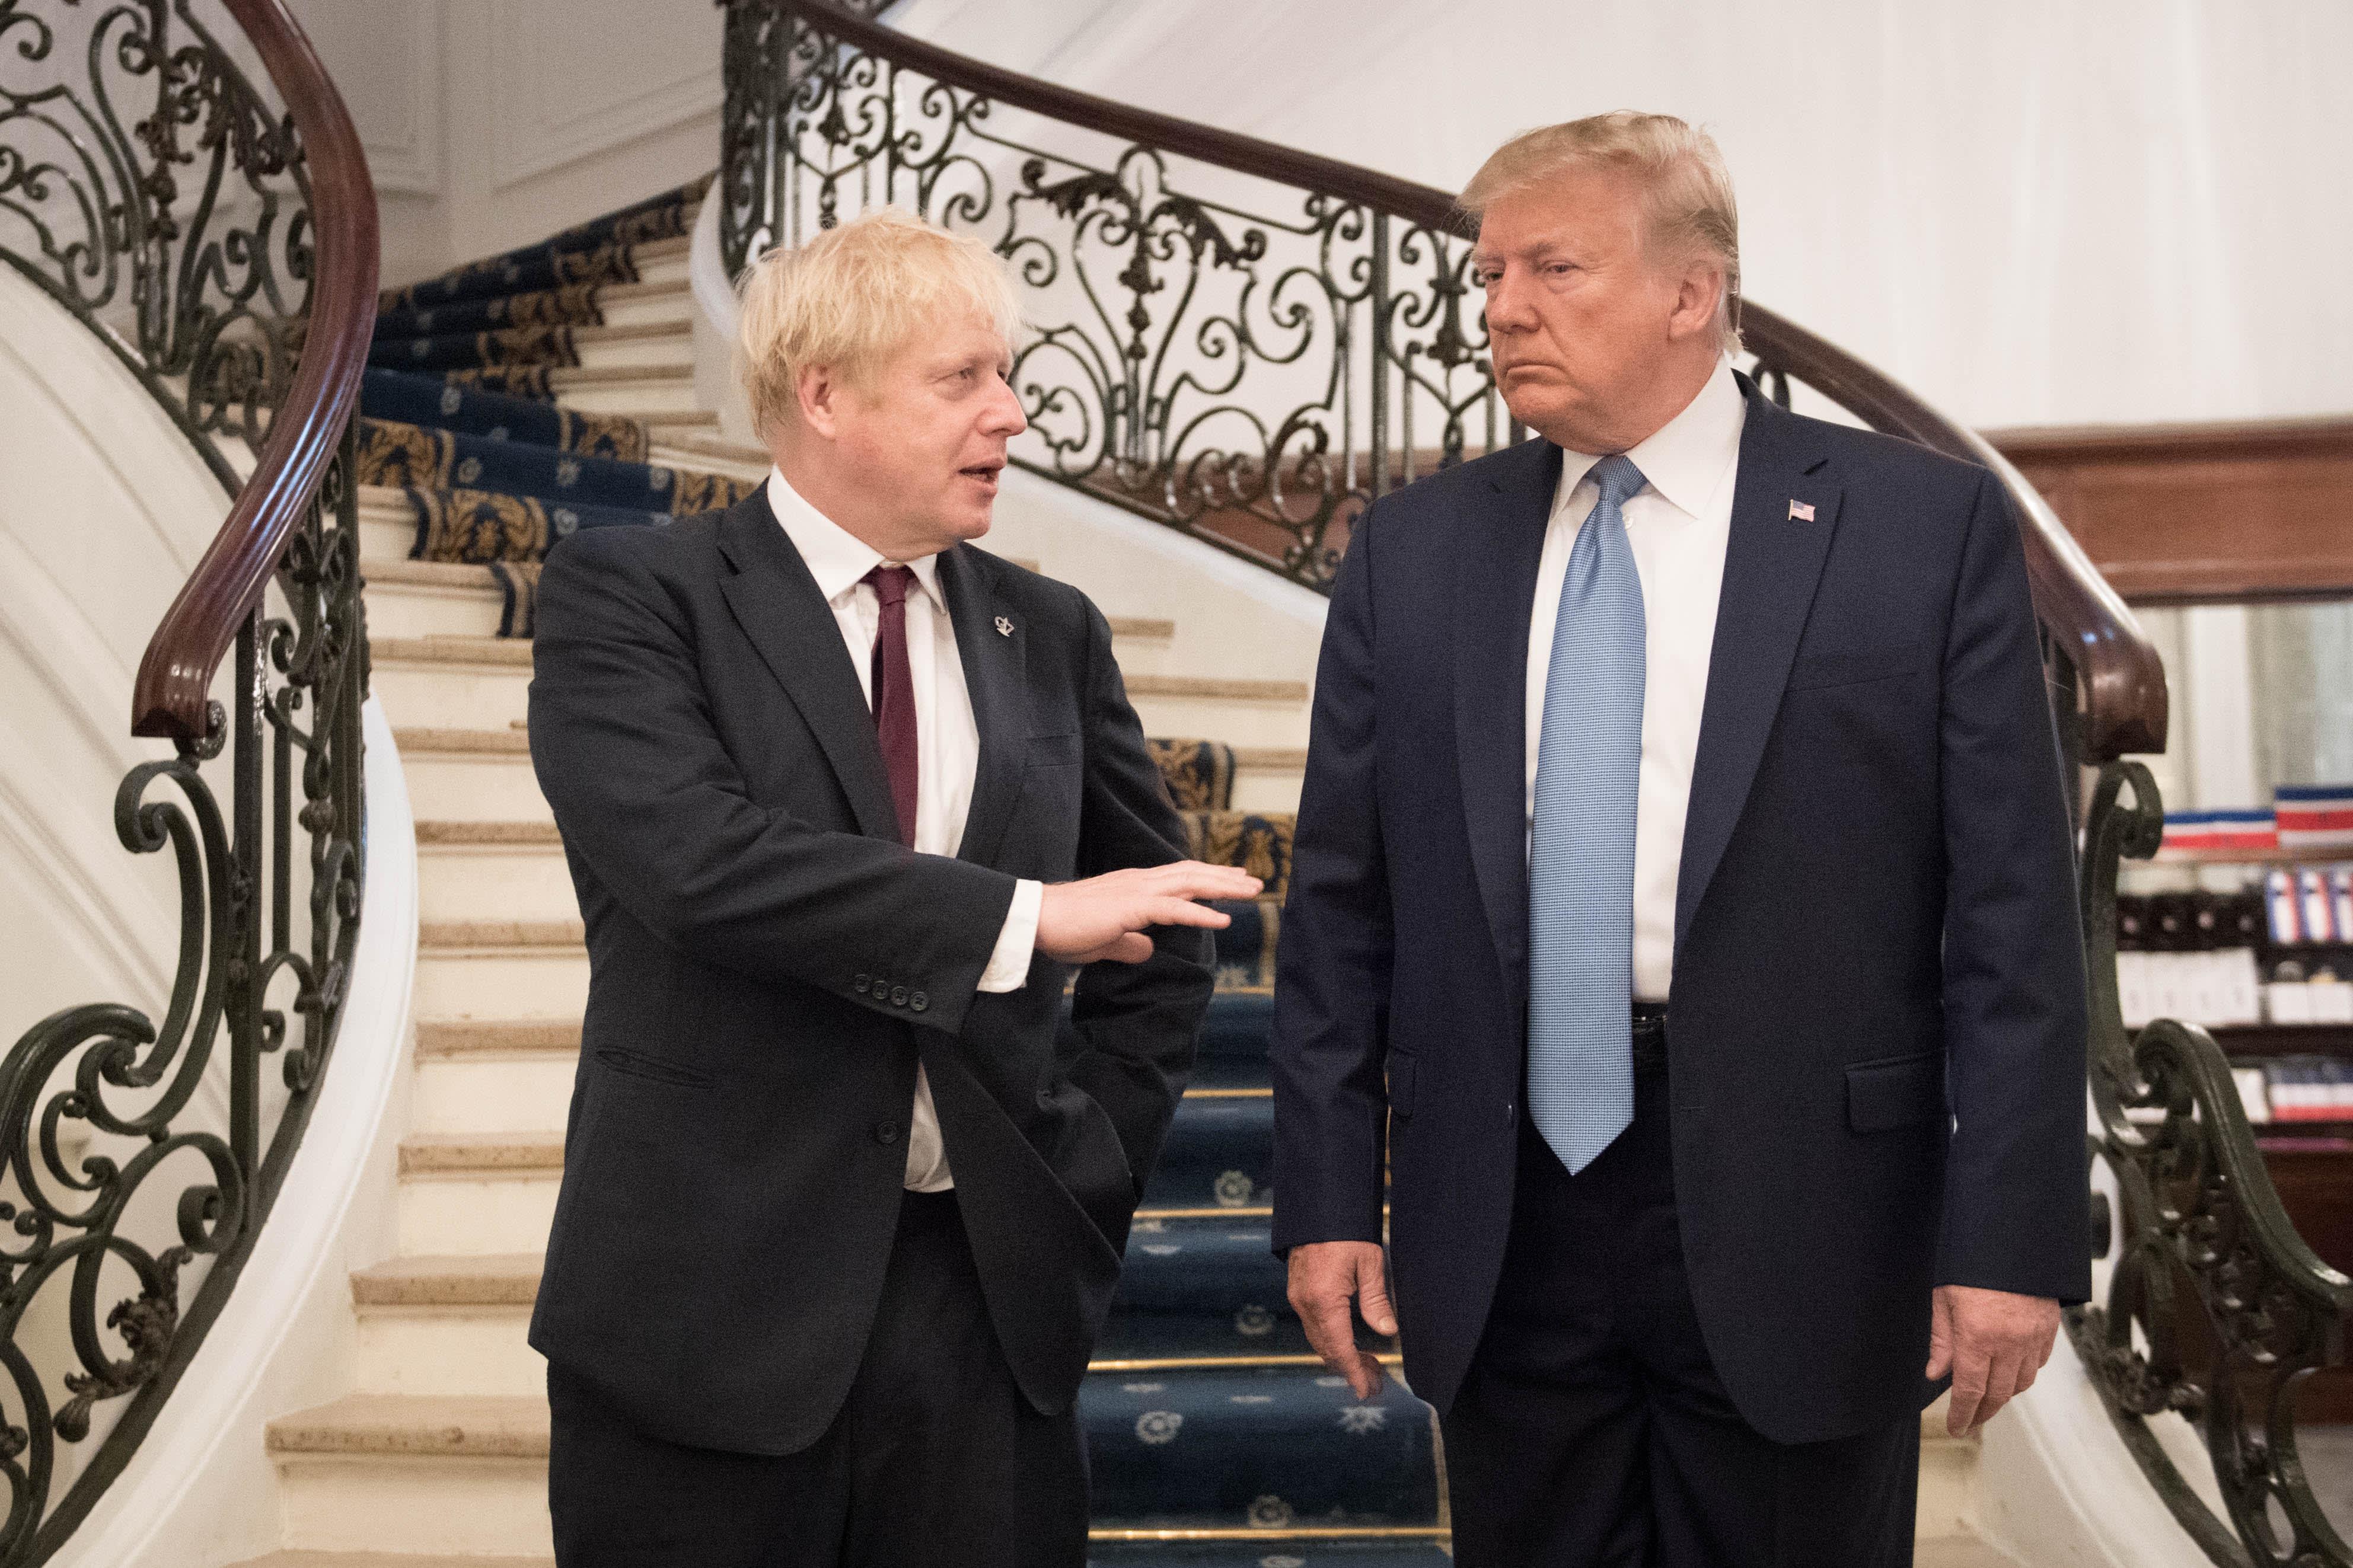 'The president and Boris will be speaking on it:' Mnuchin warns UK over digital tax plan